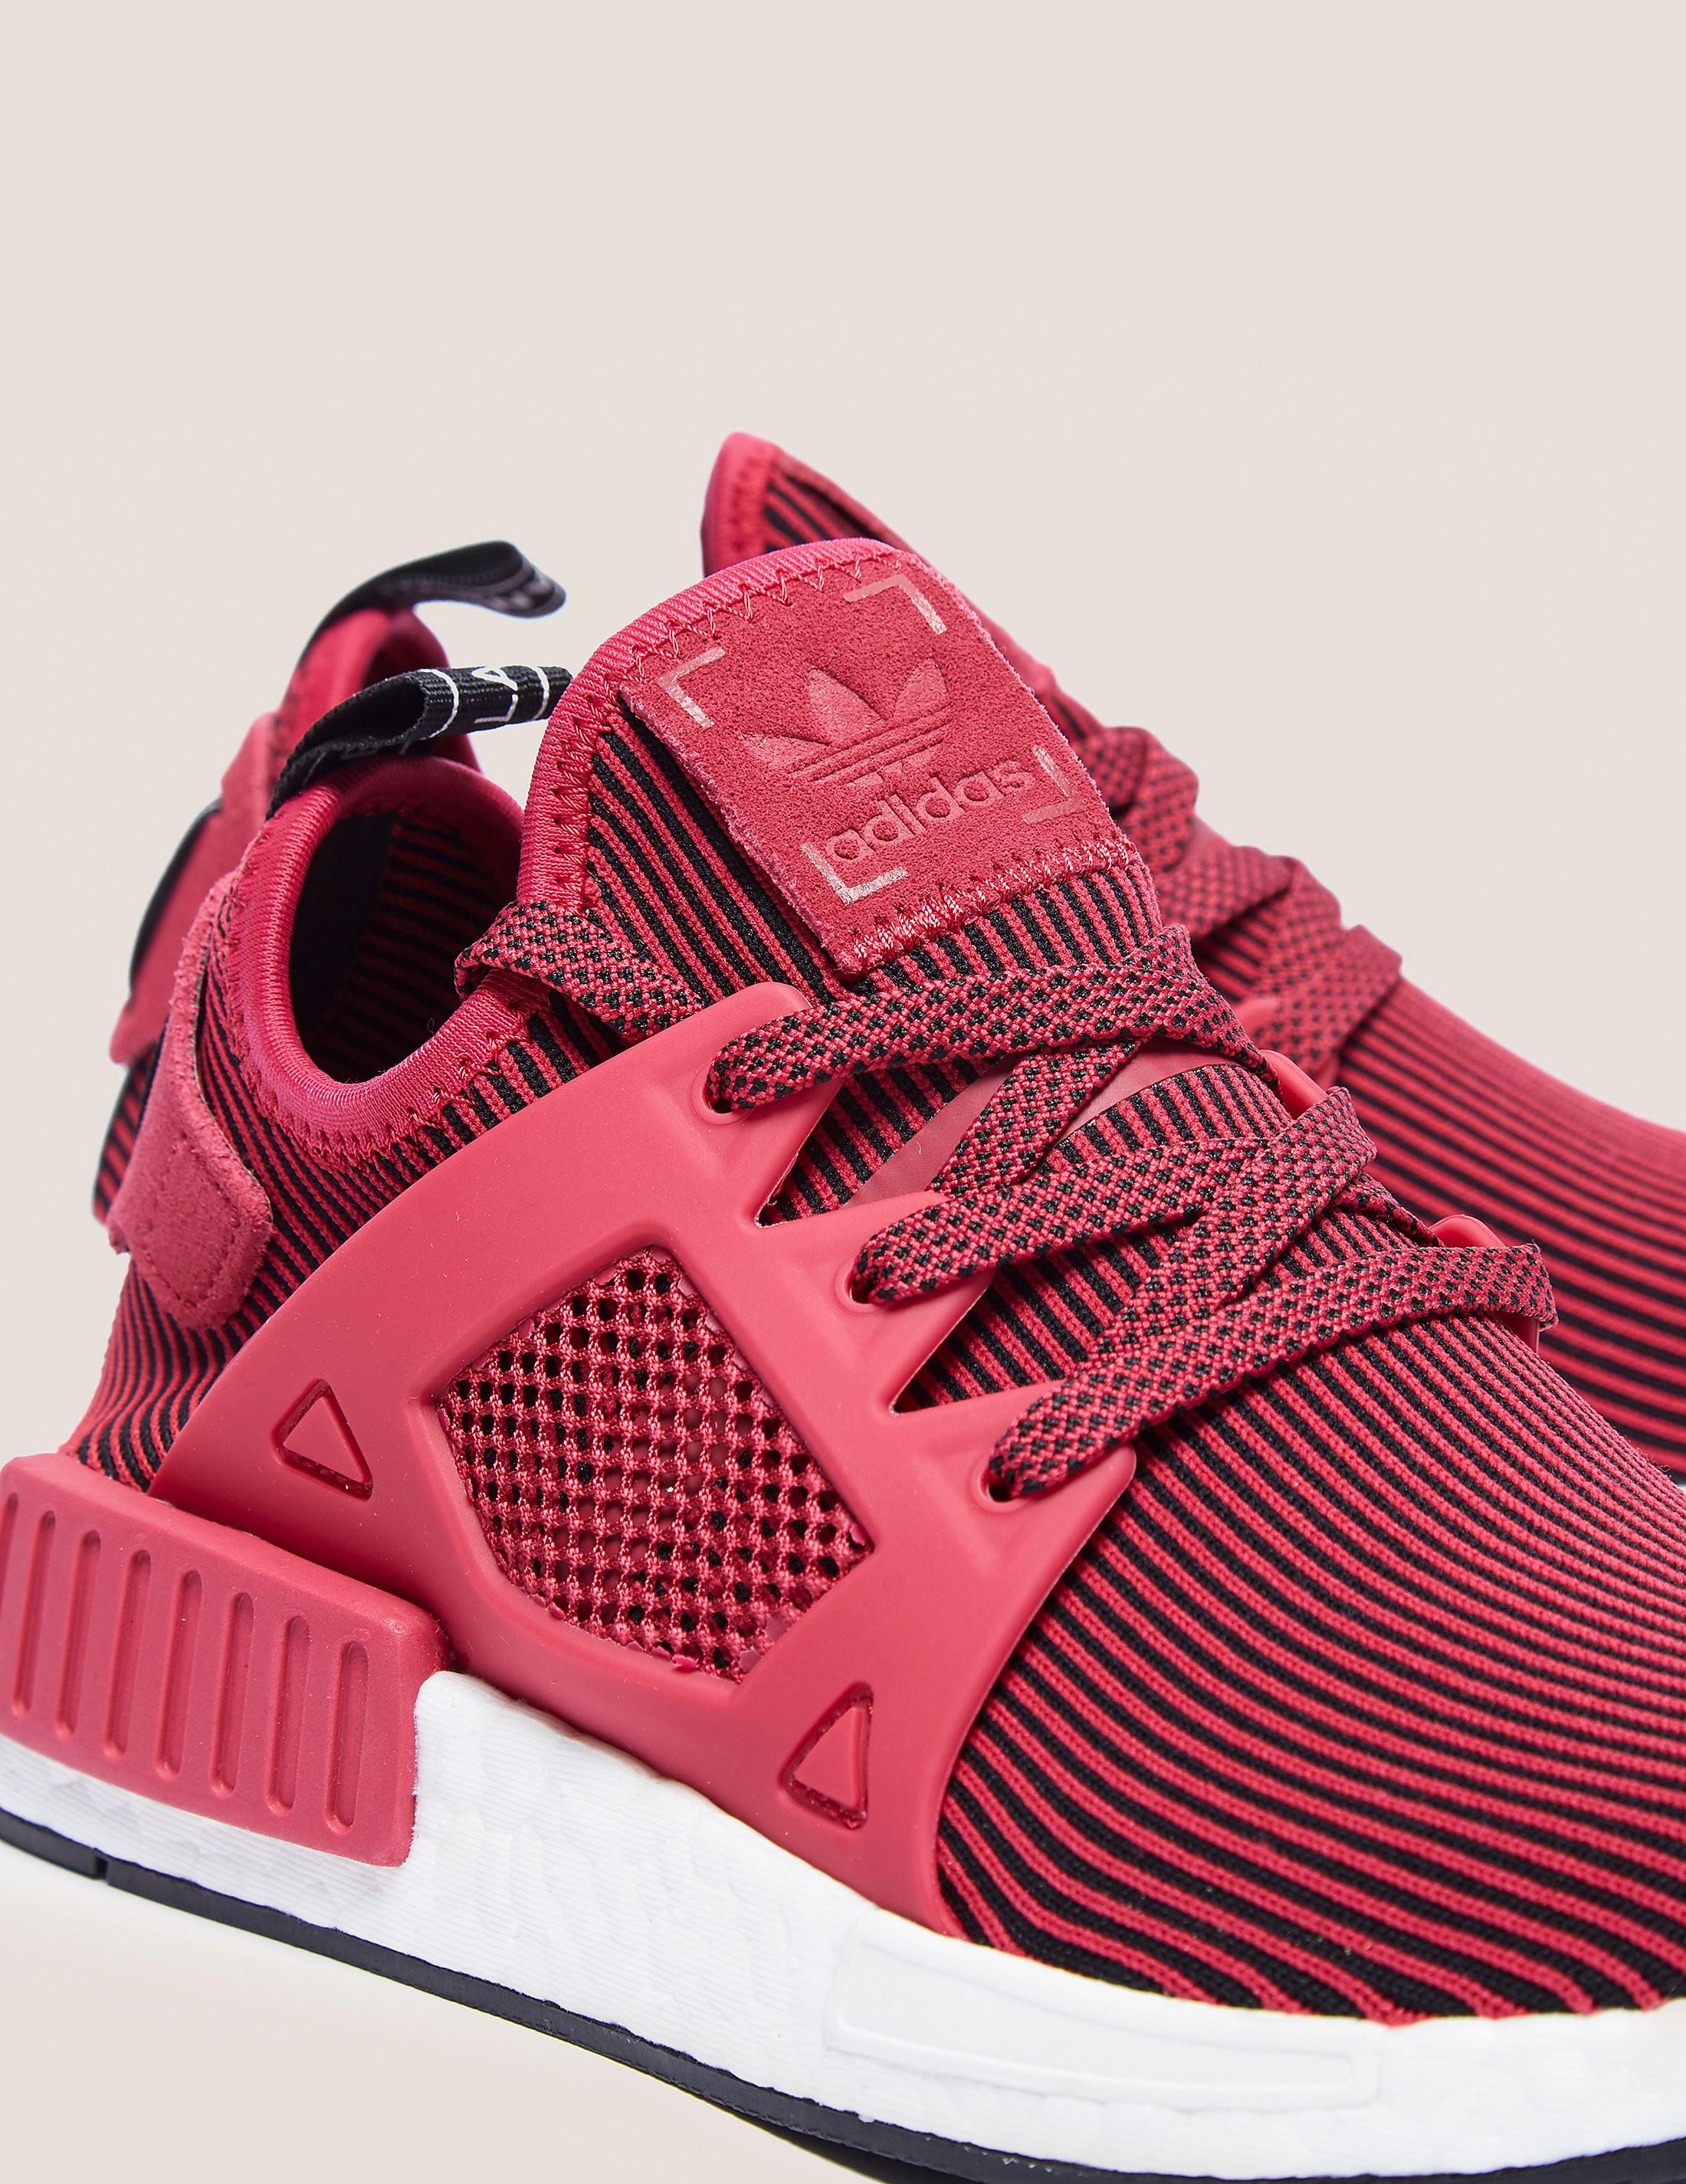 adidas Originals NMD XR1 Women's